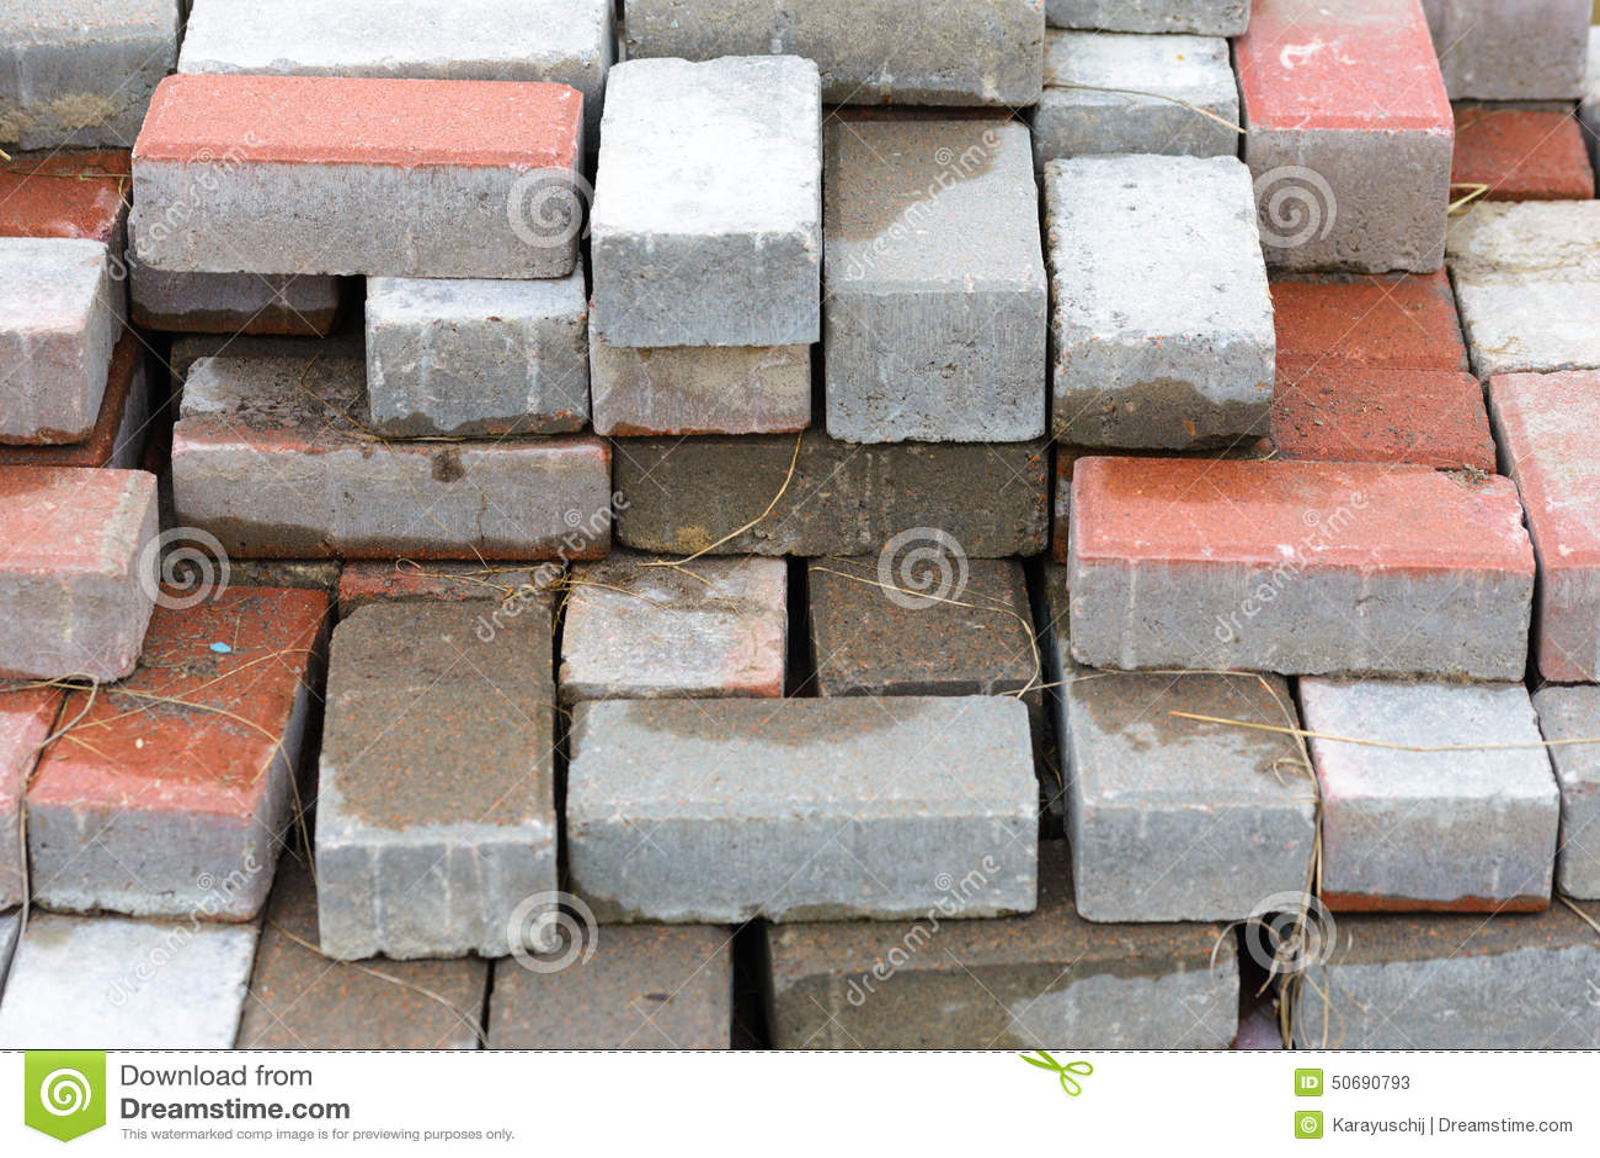 Calcium Silicate Brick Chipped : Heap of bricks stock photo image